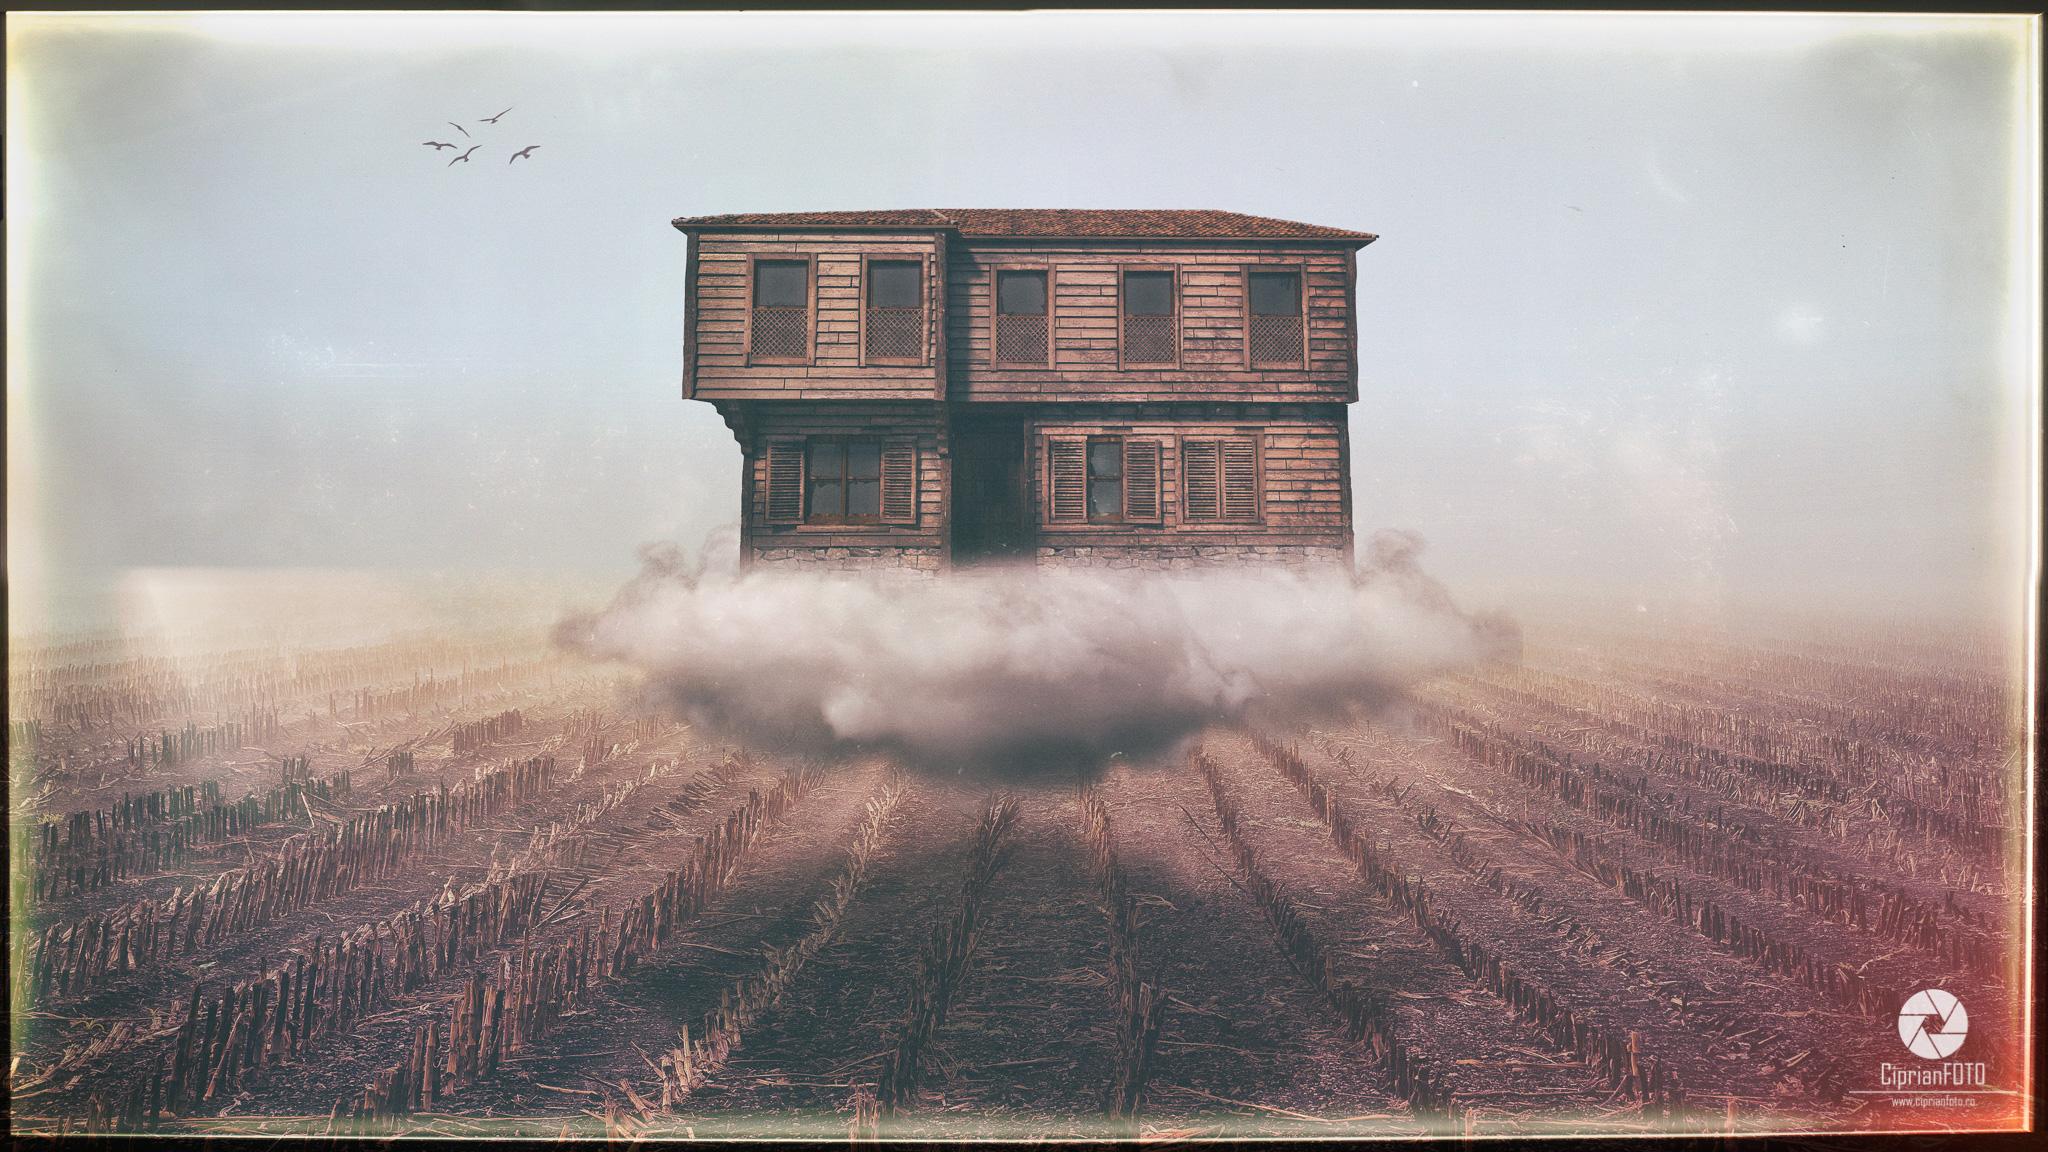 Floating House, Fine Art Scene, Photoshop Manipulation Tutorial, CiprianFOTO